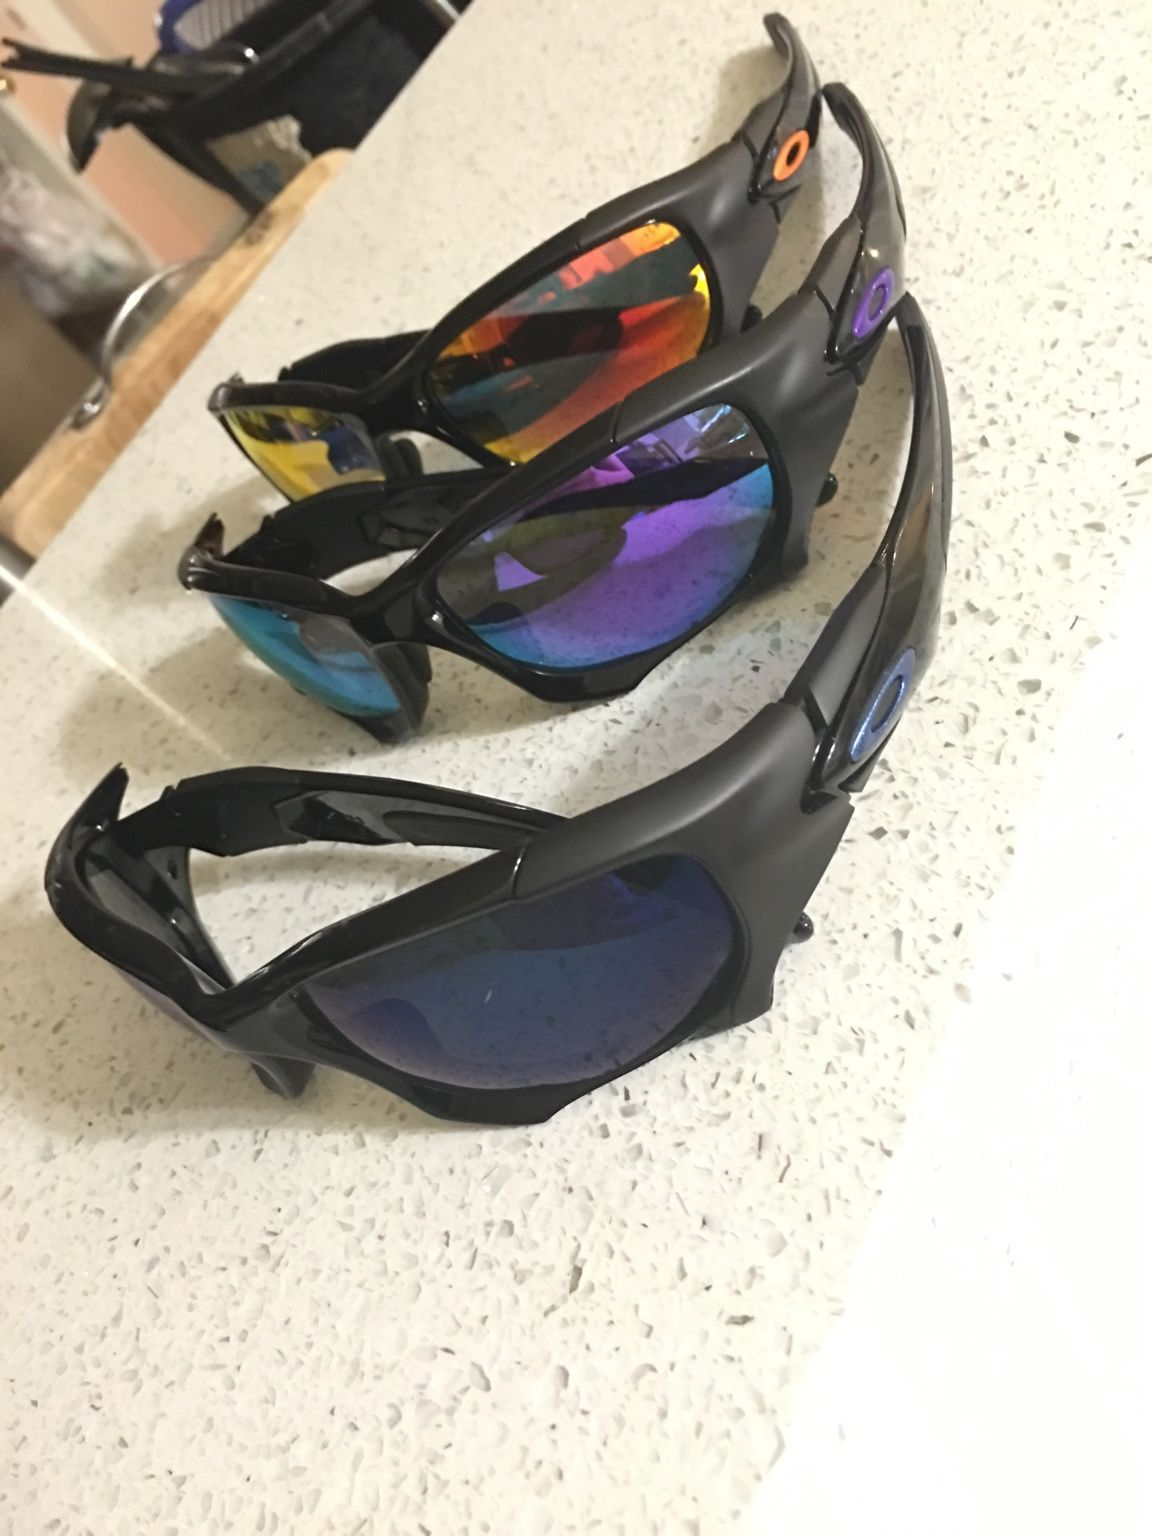 PB2 with custom lenses, let's see whatchu got! - 8ff42bf83268412c83645c678b4ae39f.jpg